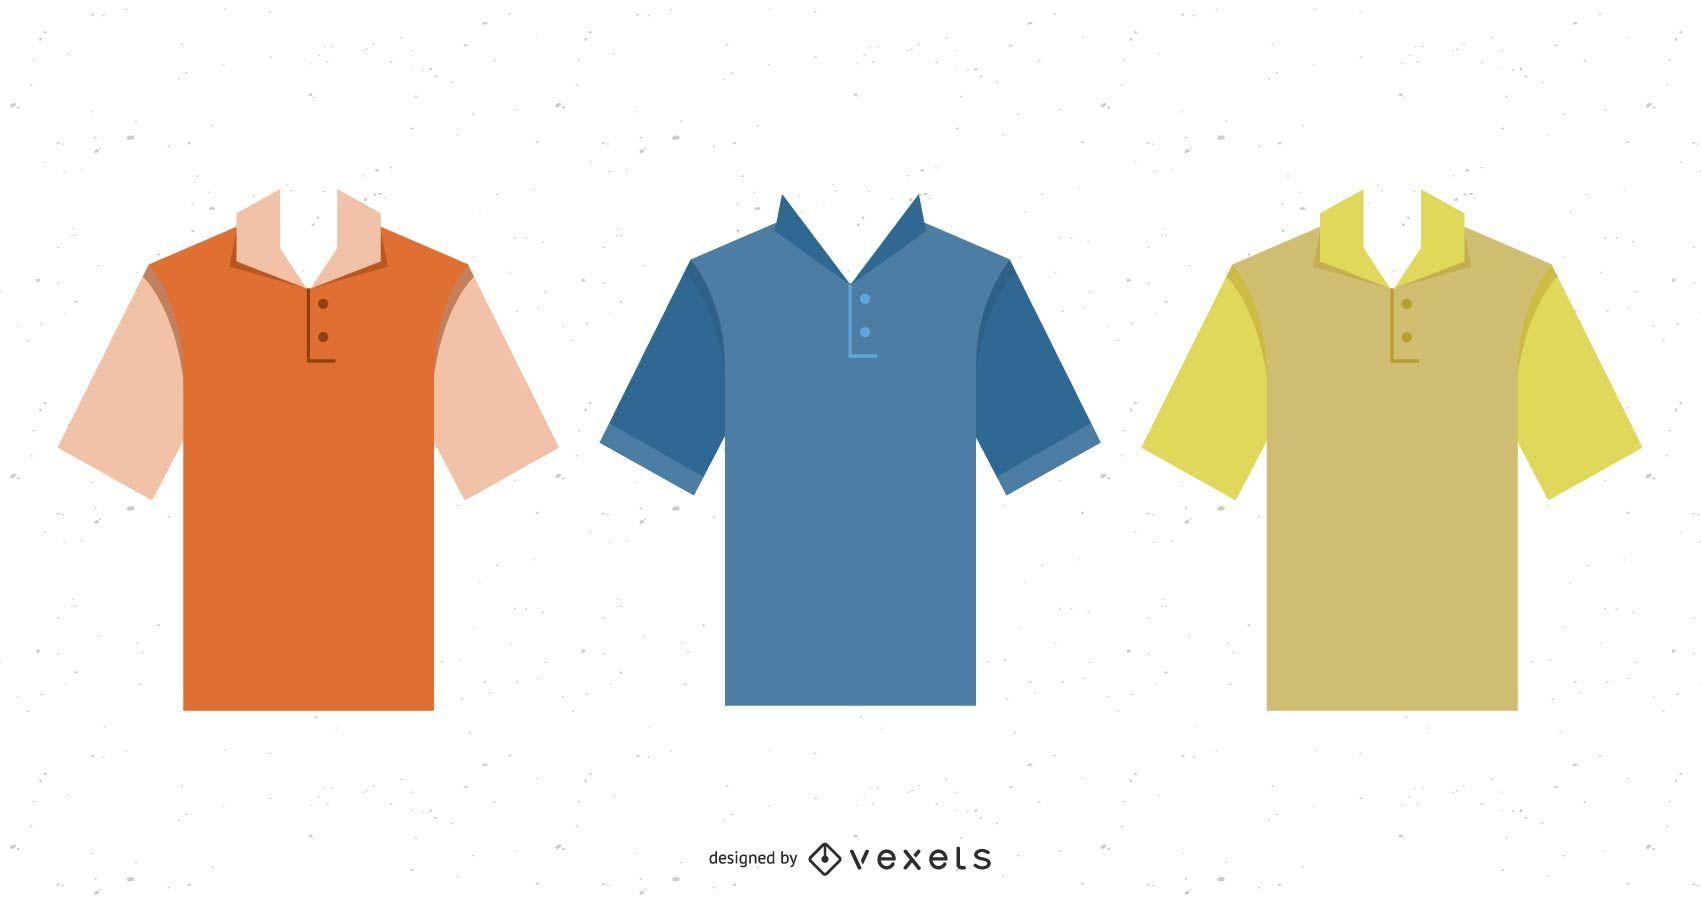 T-shirts Vector Homem Polo